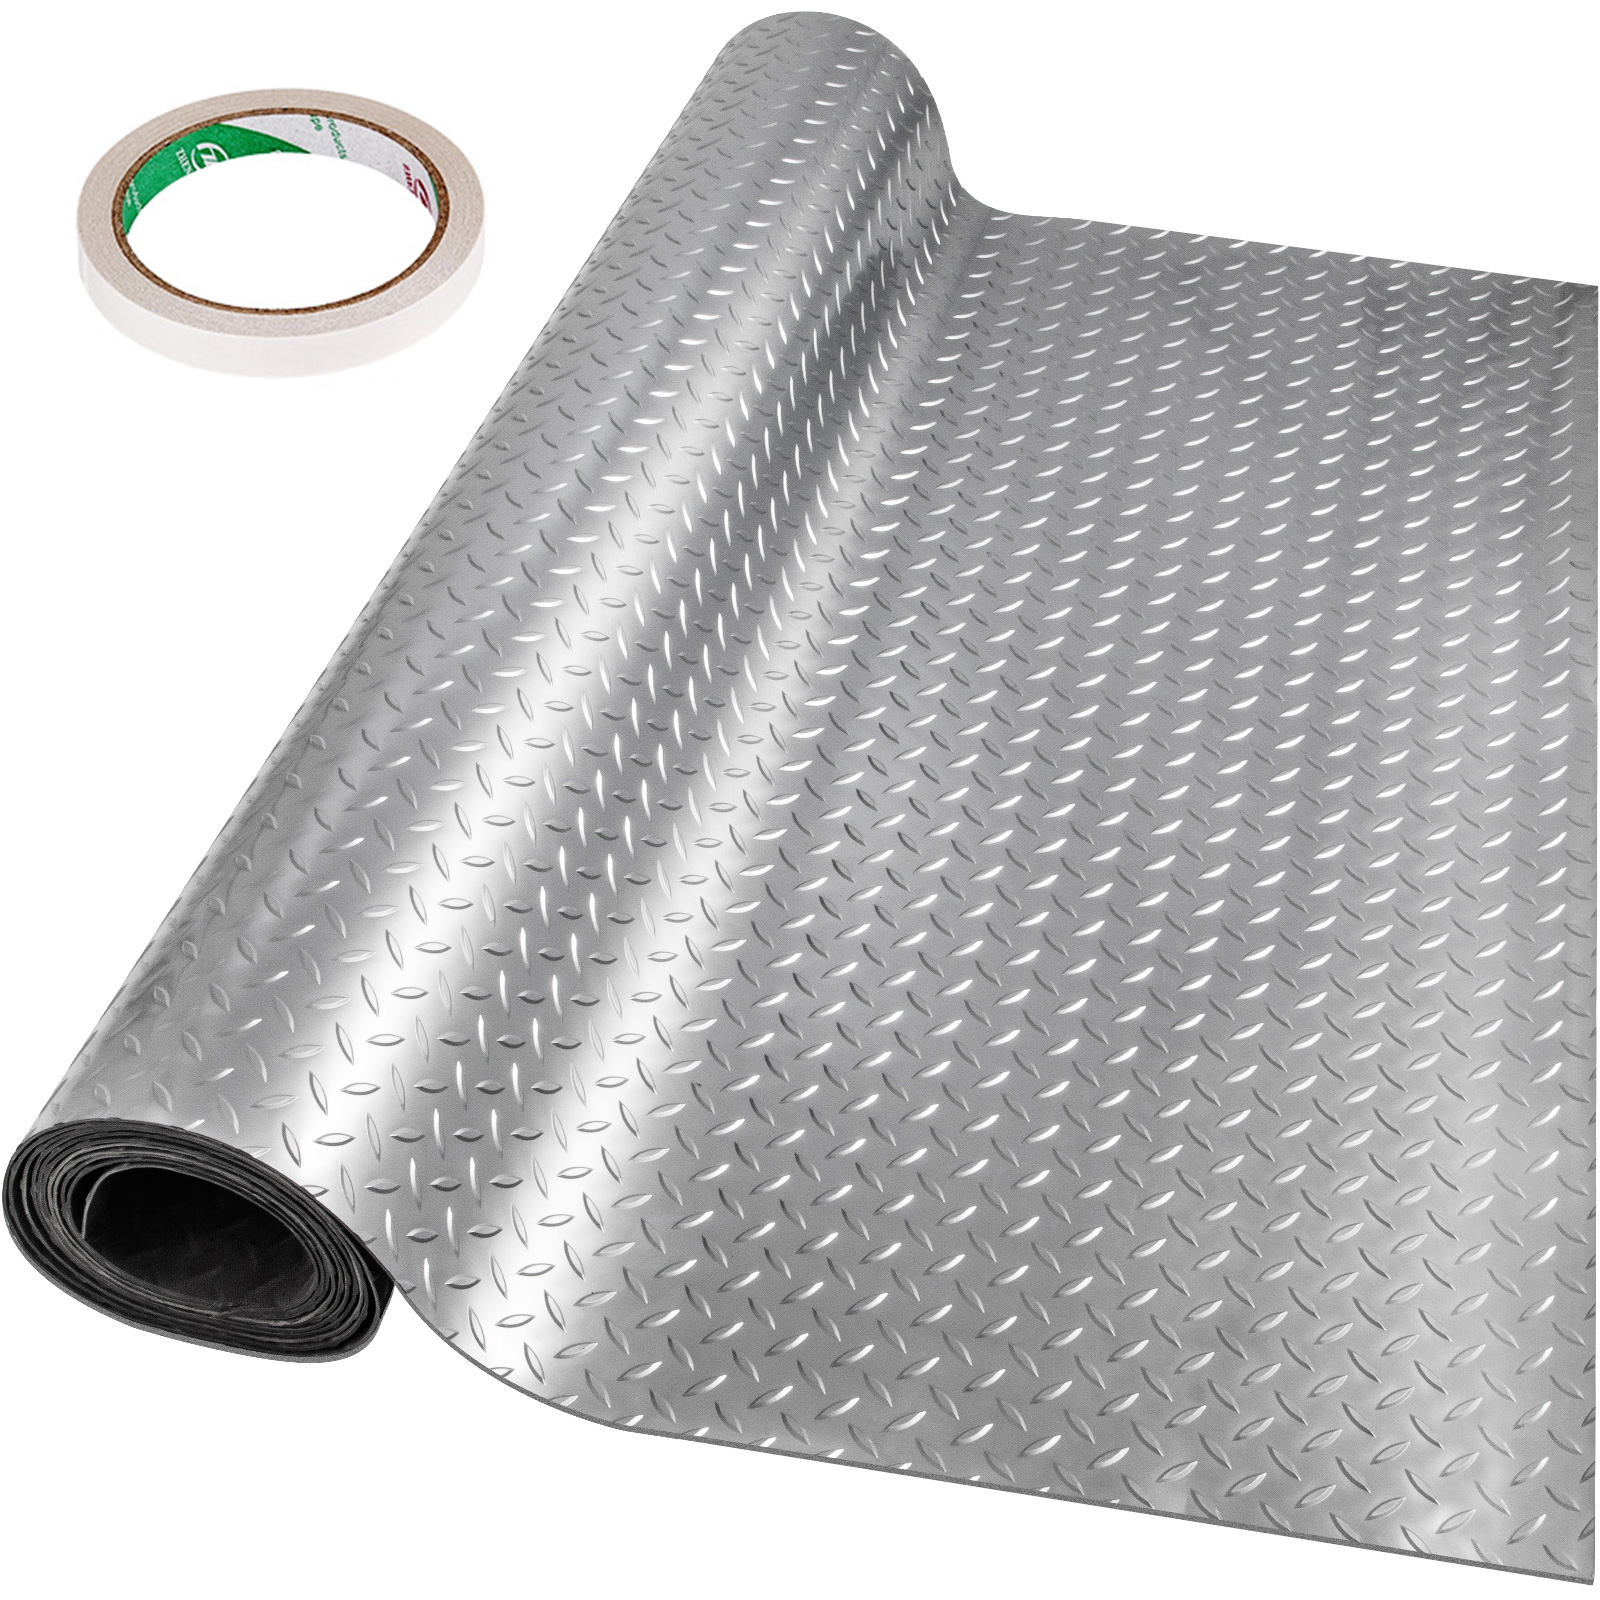 thumbnail 49 - Garage Flooring Mat Roll Car Trailer Floor Covering 1.1m Width Gym Floor Roll